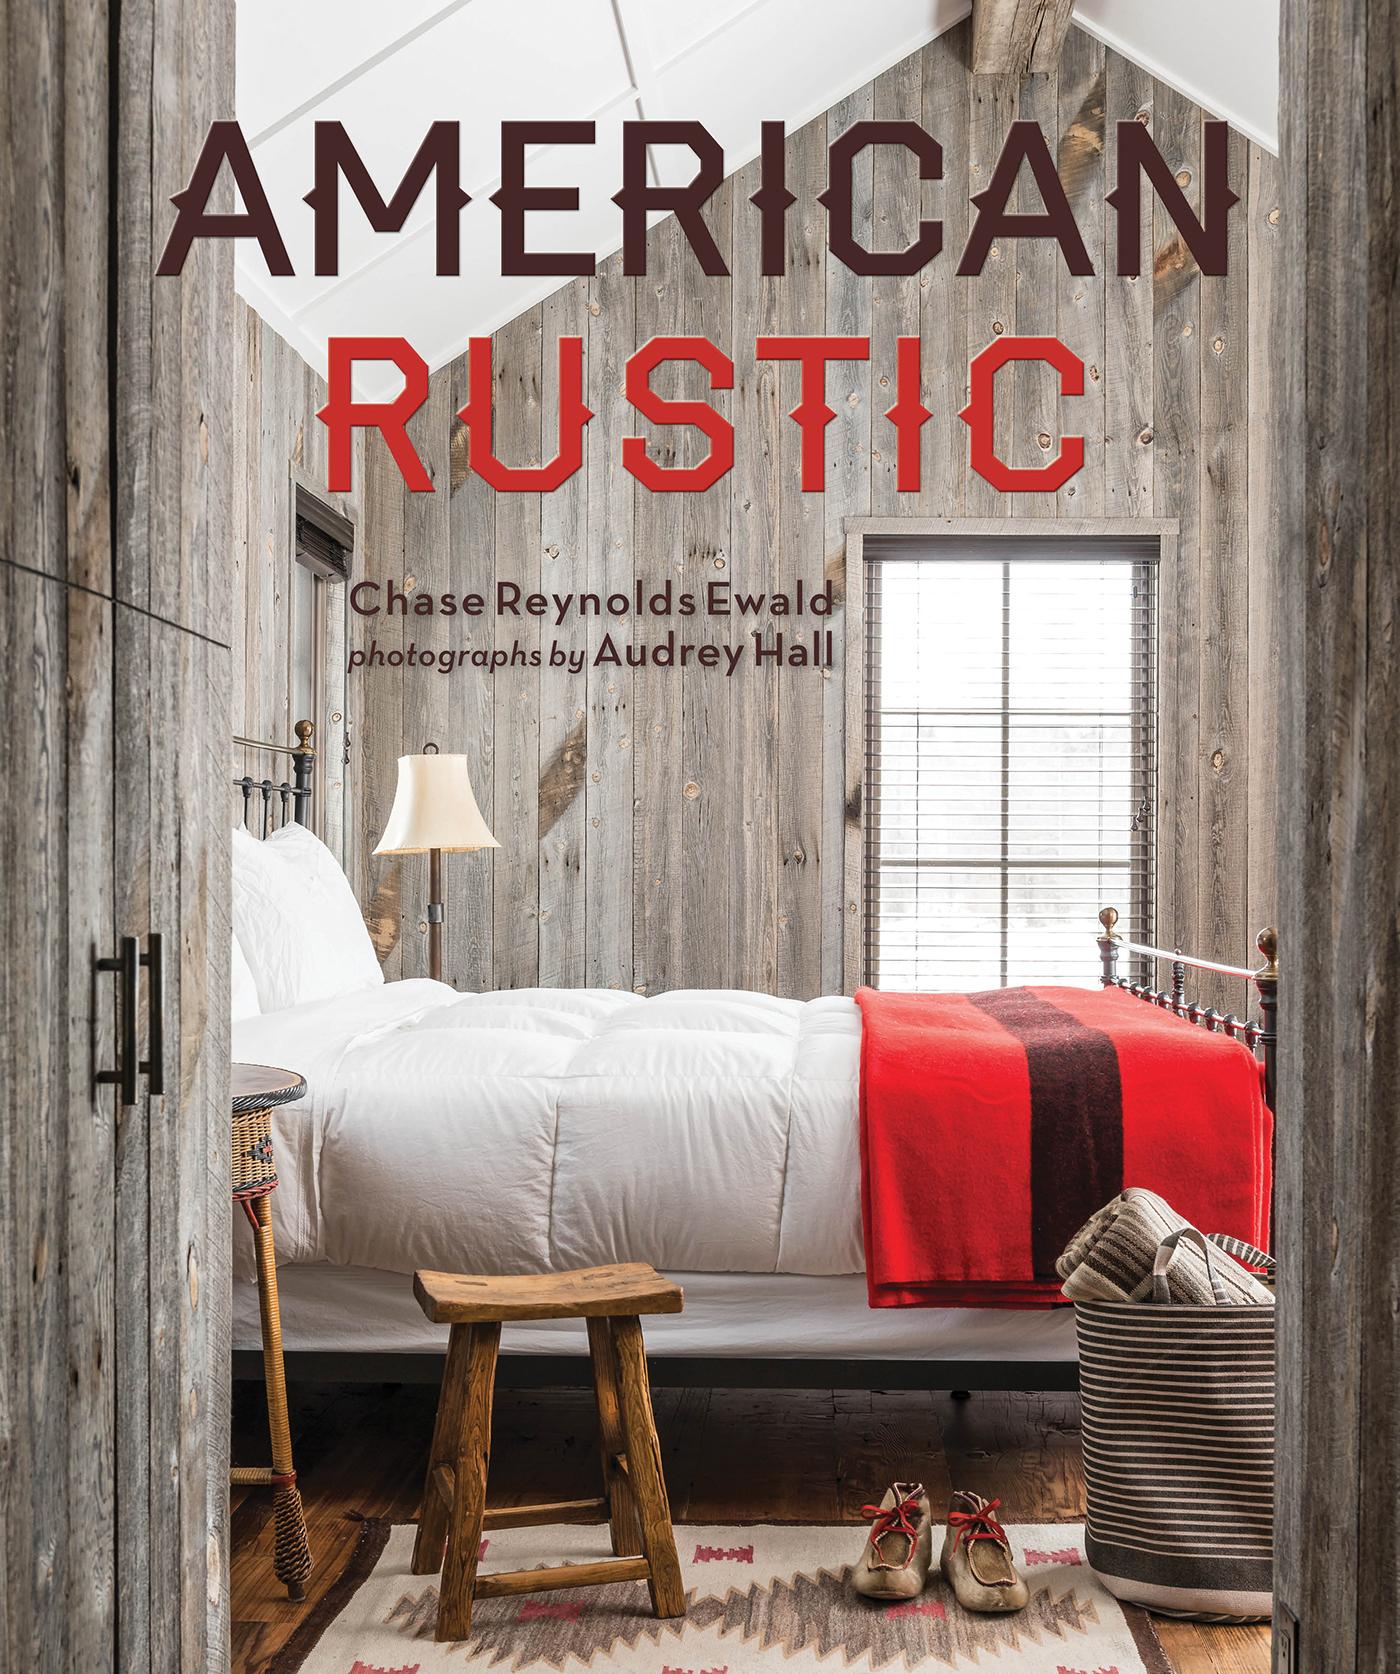 American-Rustic-Gibbs Smith.jpg